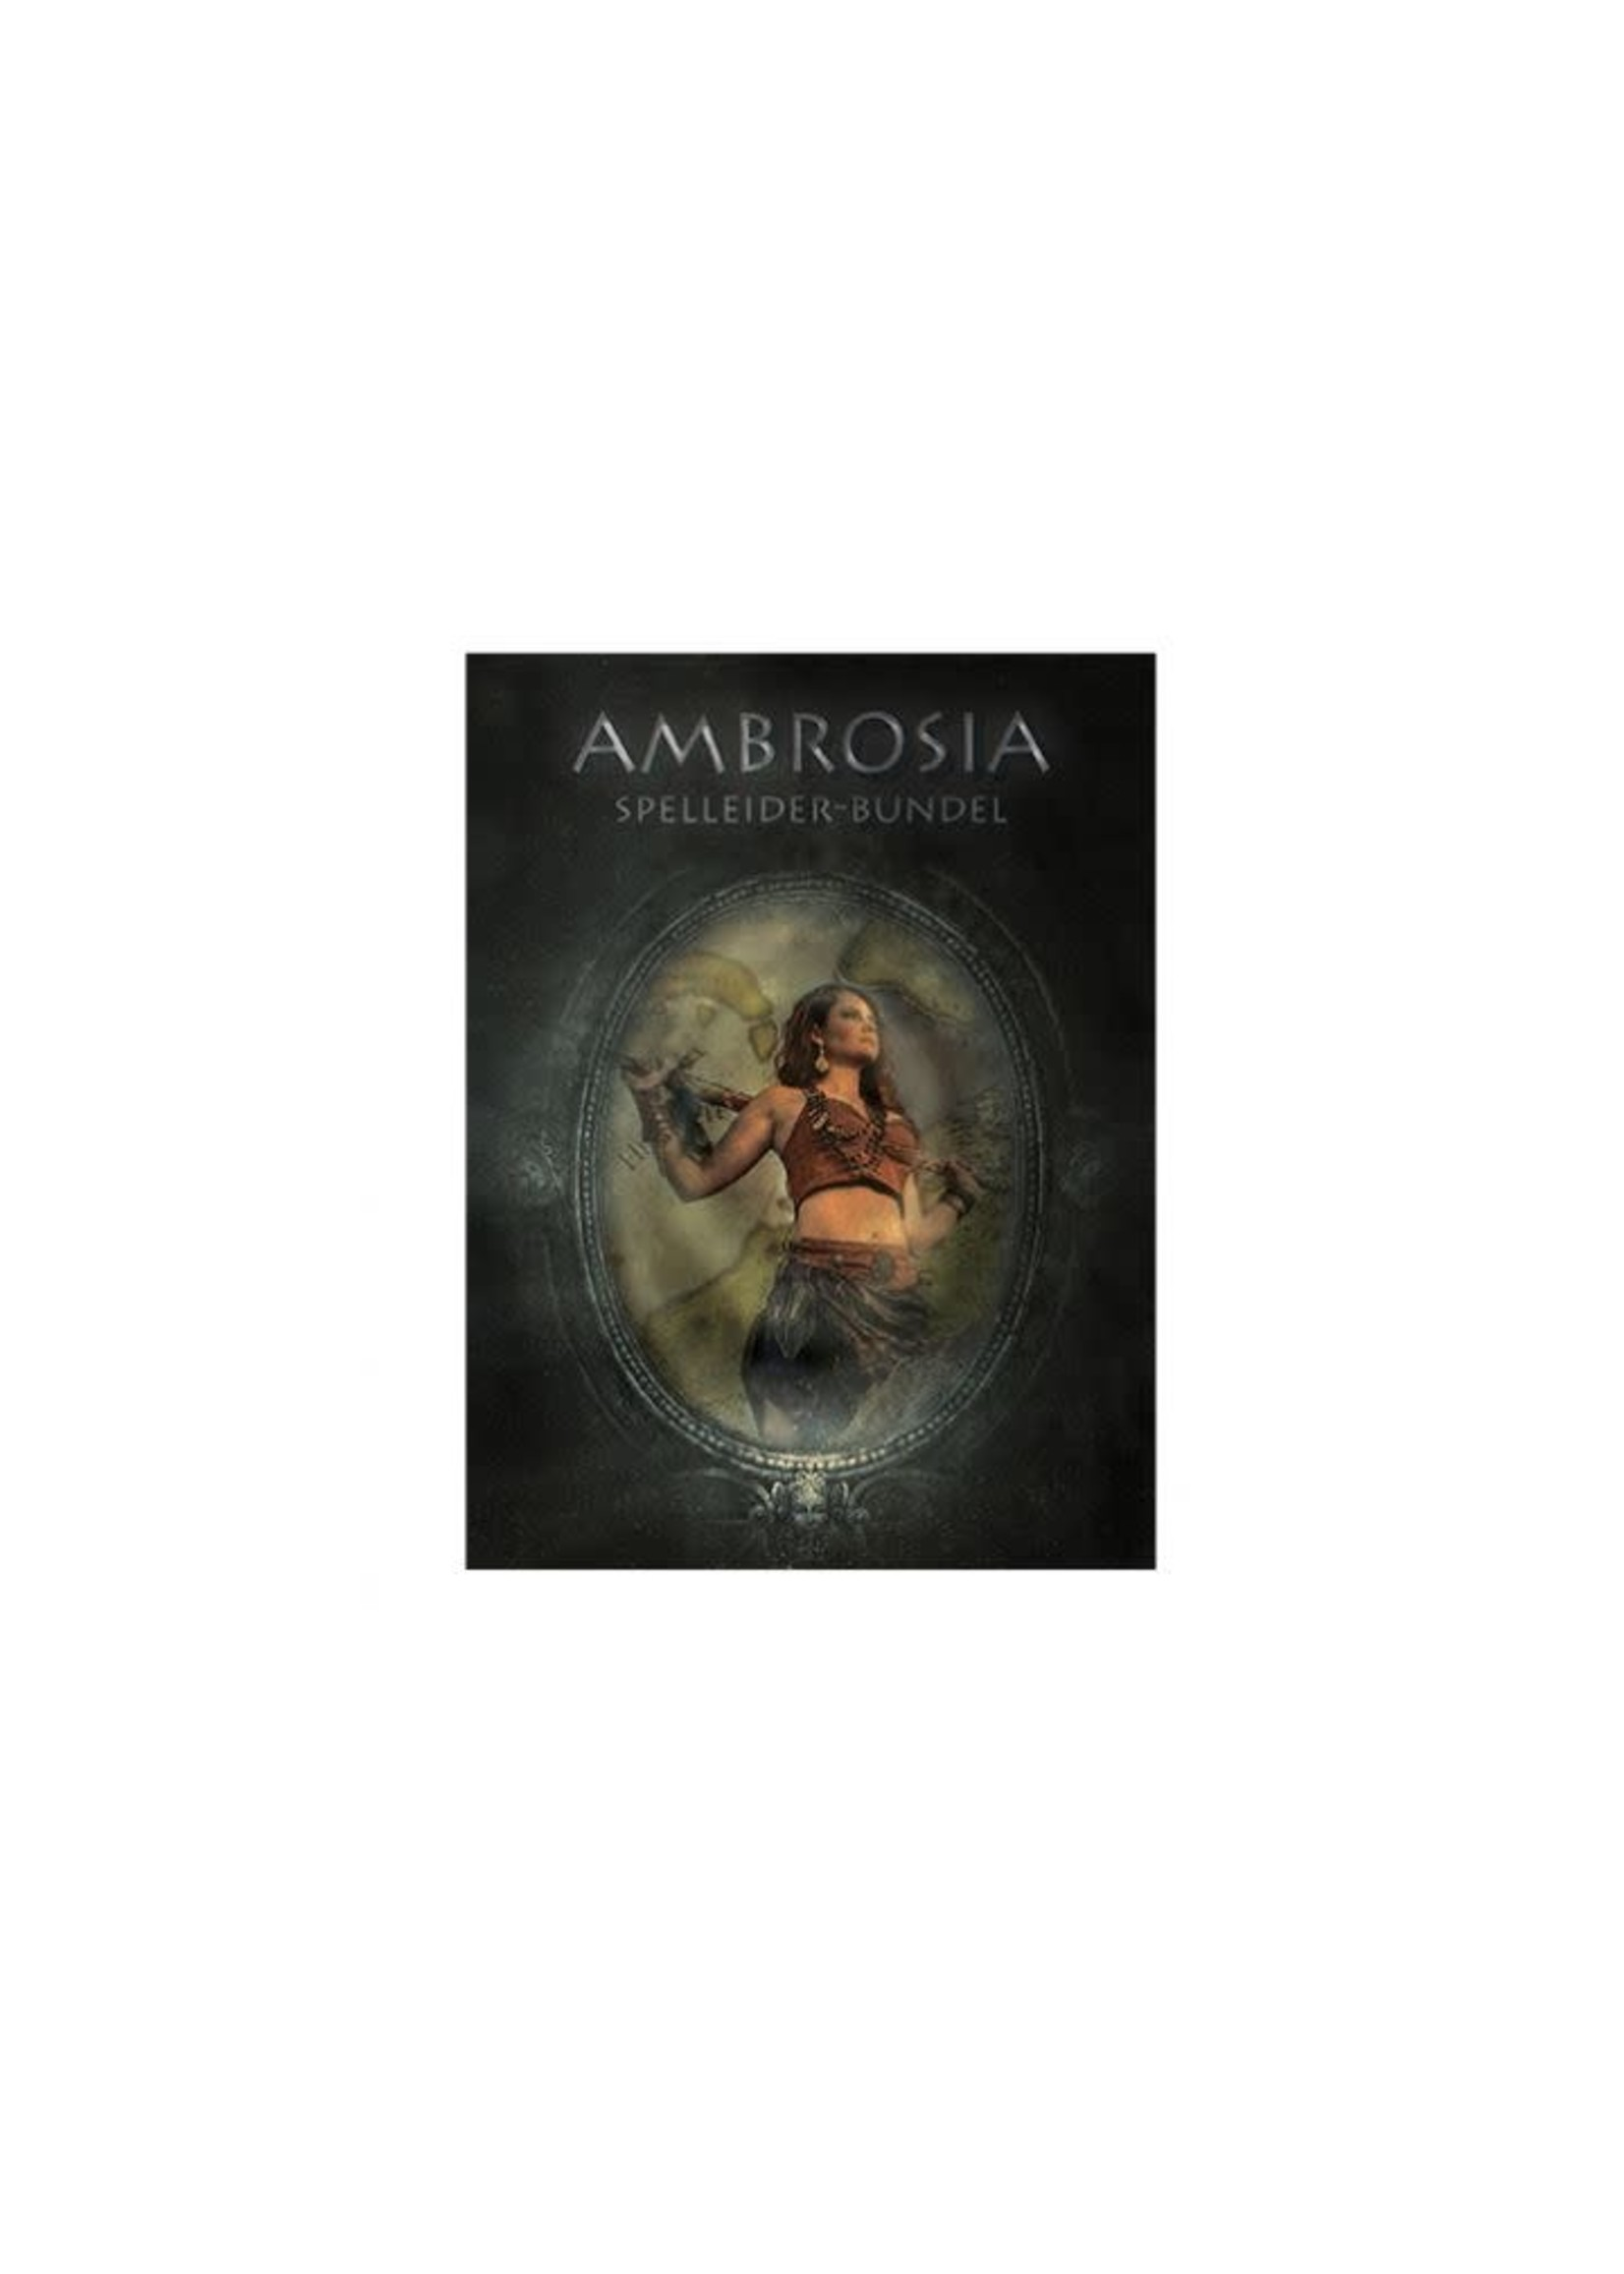 Ambrosia Spelleider-Bundel